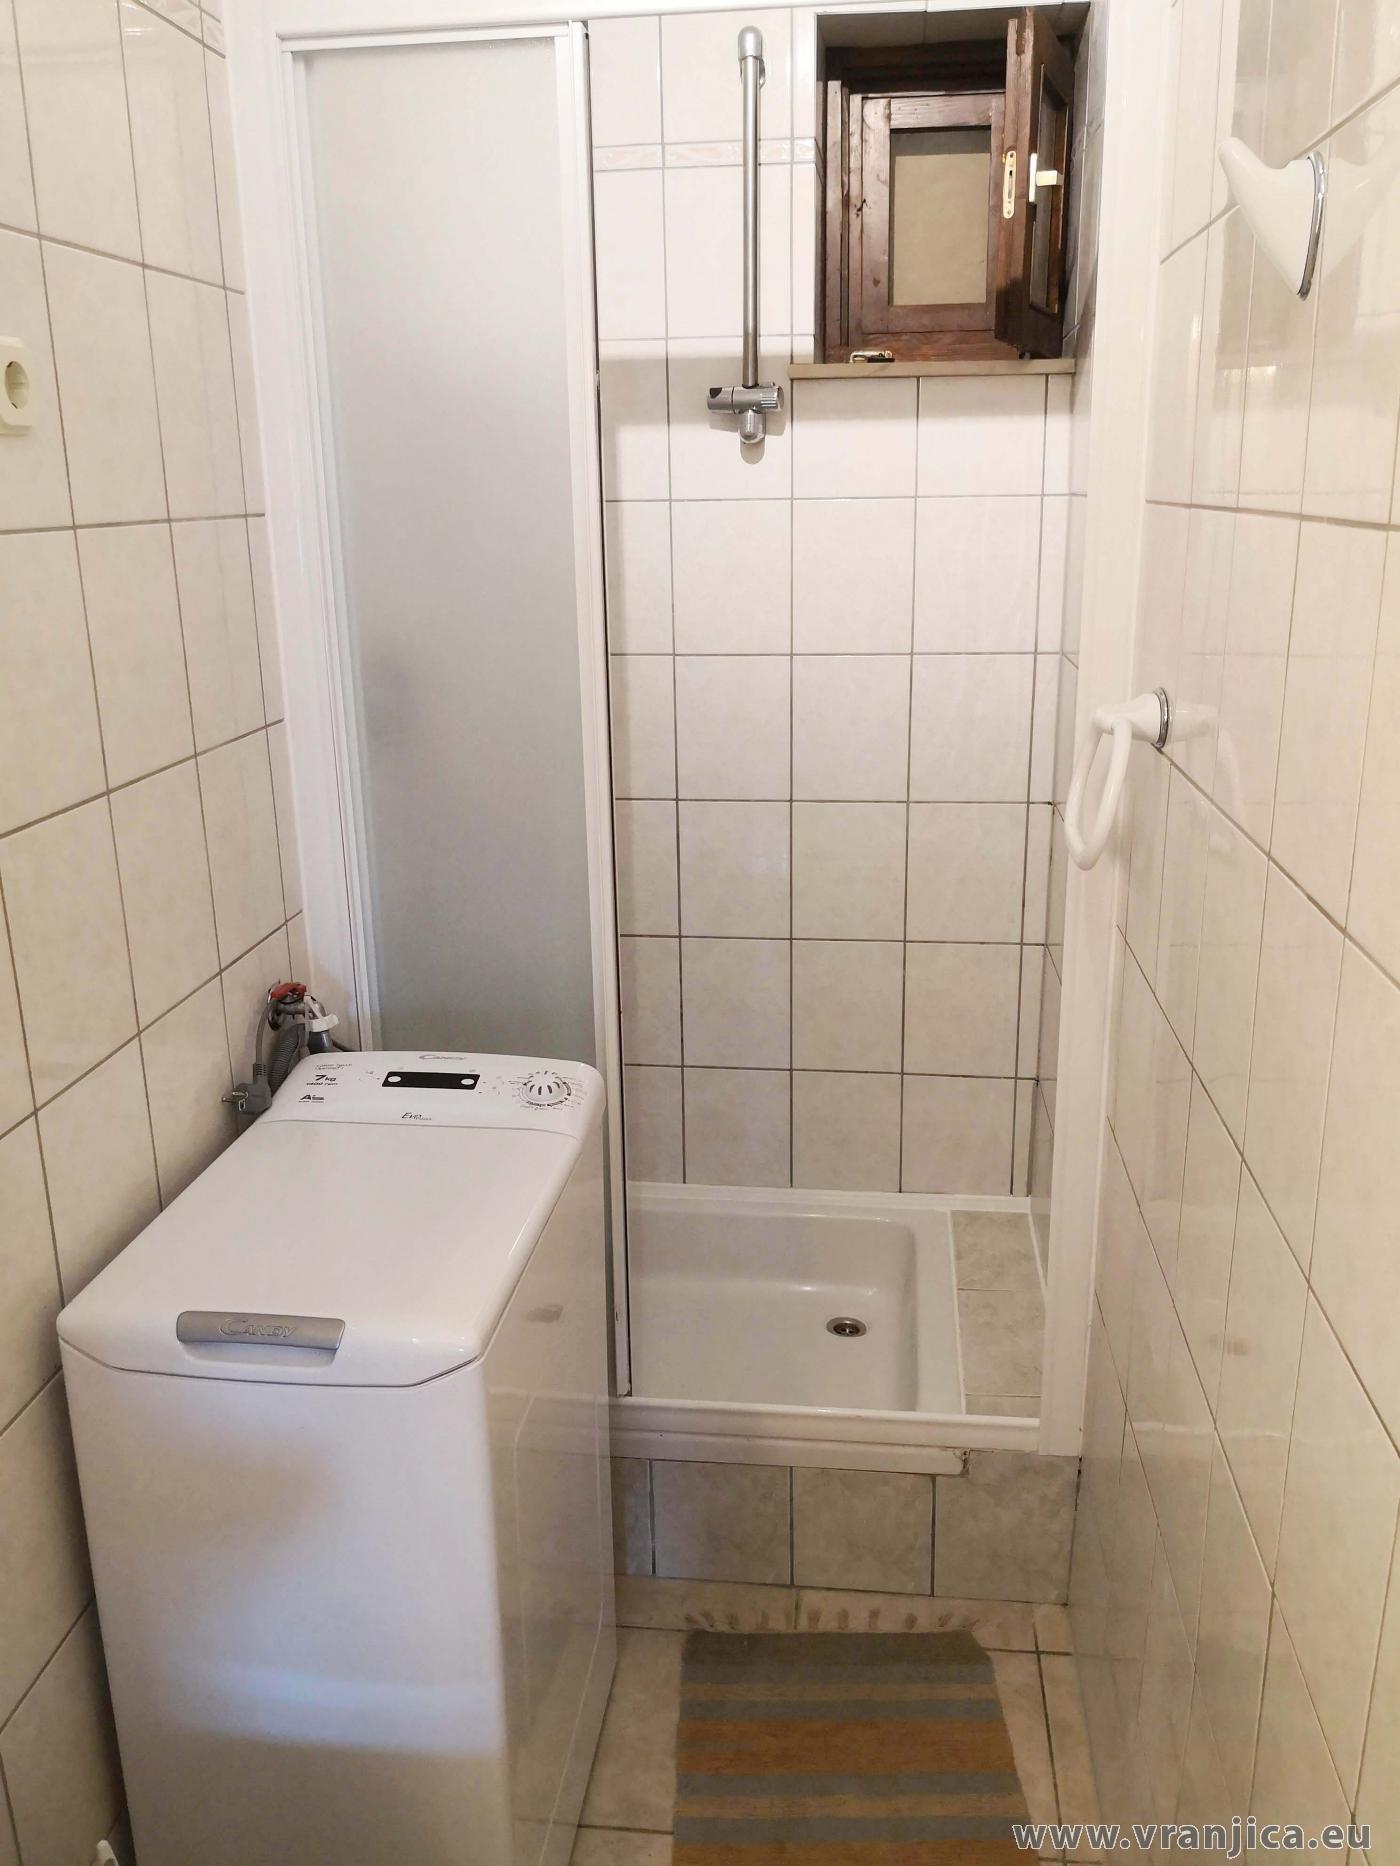 https://www.vranjica.eu/pokoje/apartman-martin-ap1-2-2-1573305157L.jpg